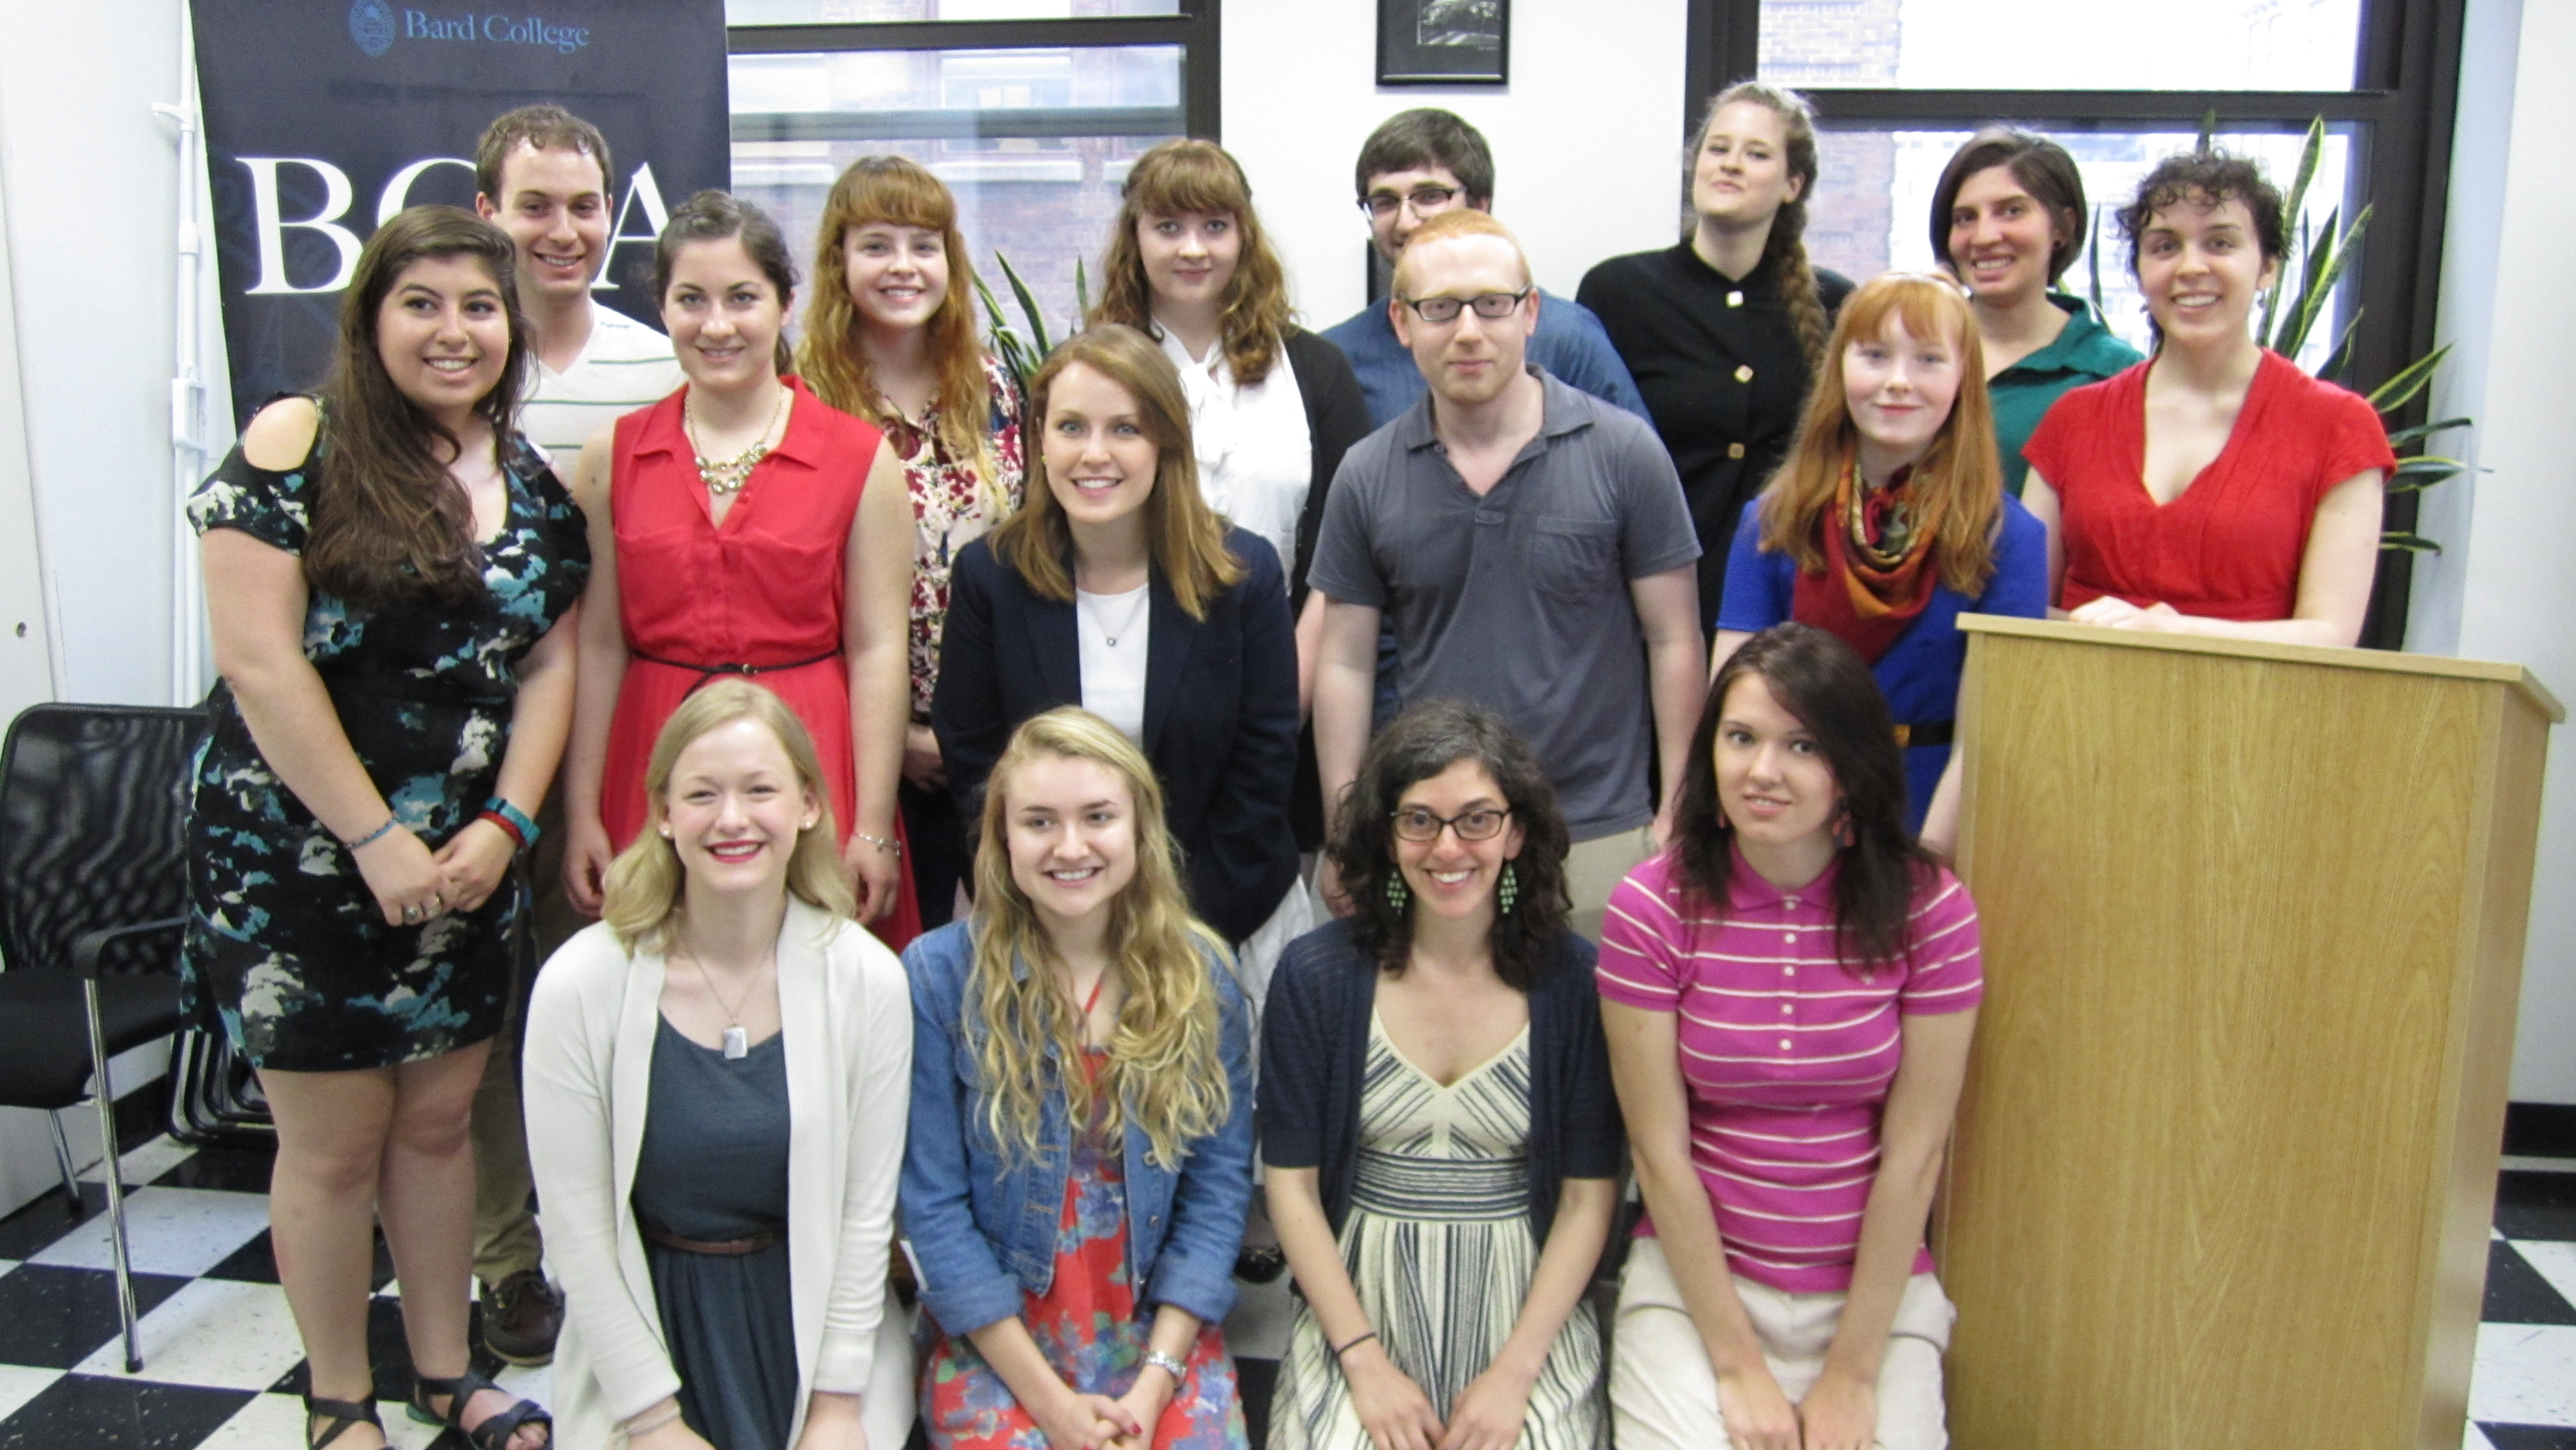 This Week at BGIA: Spring 2014 Graduation